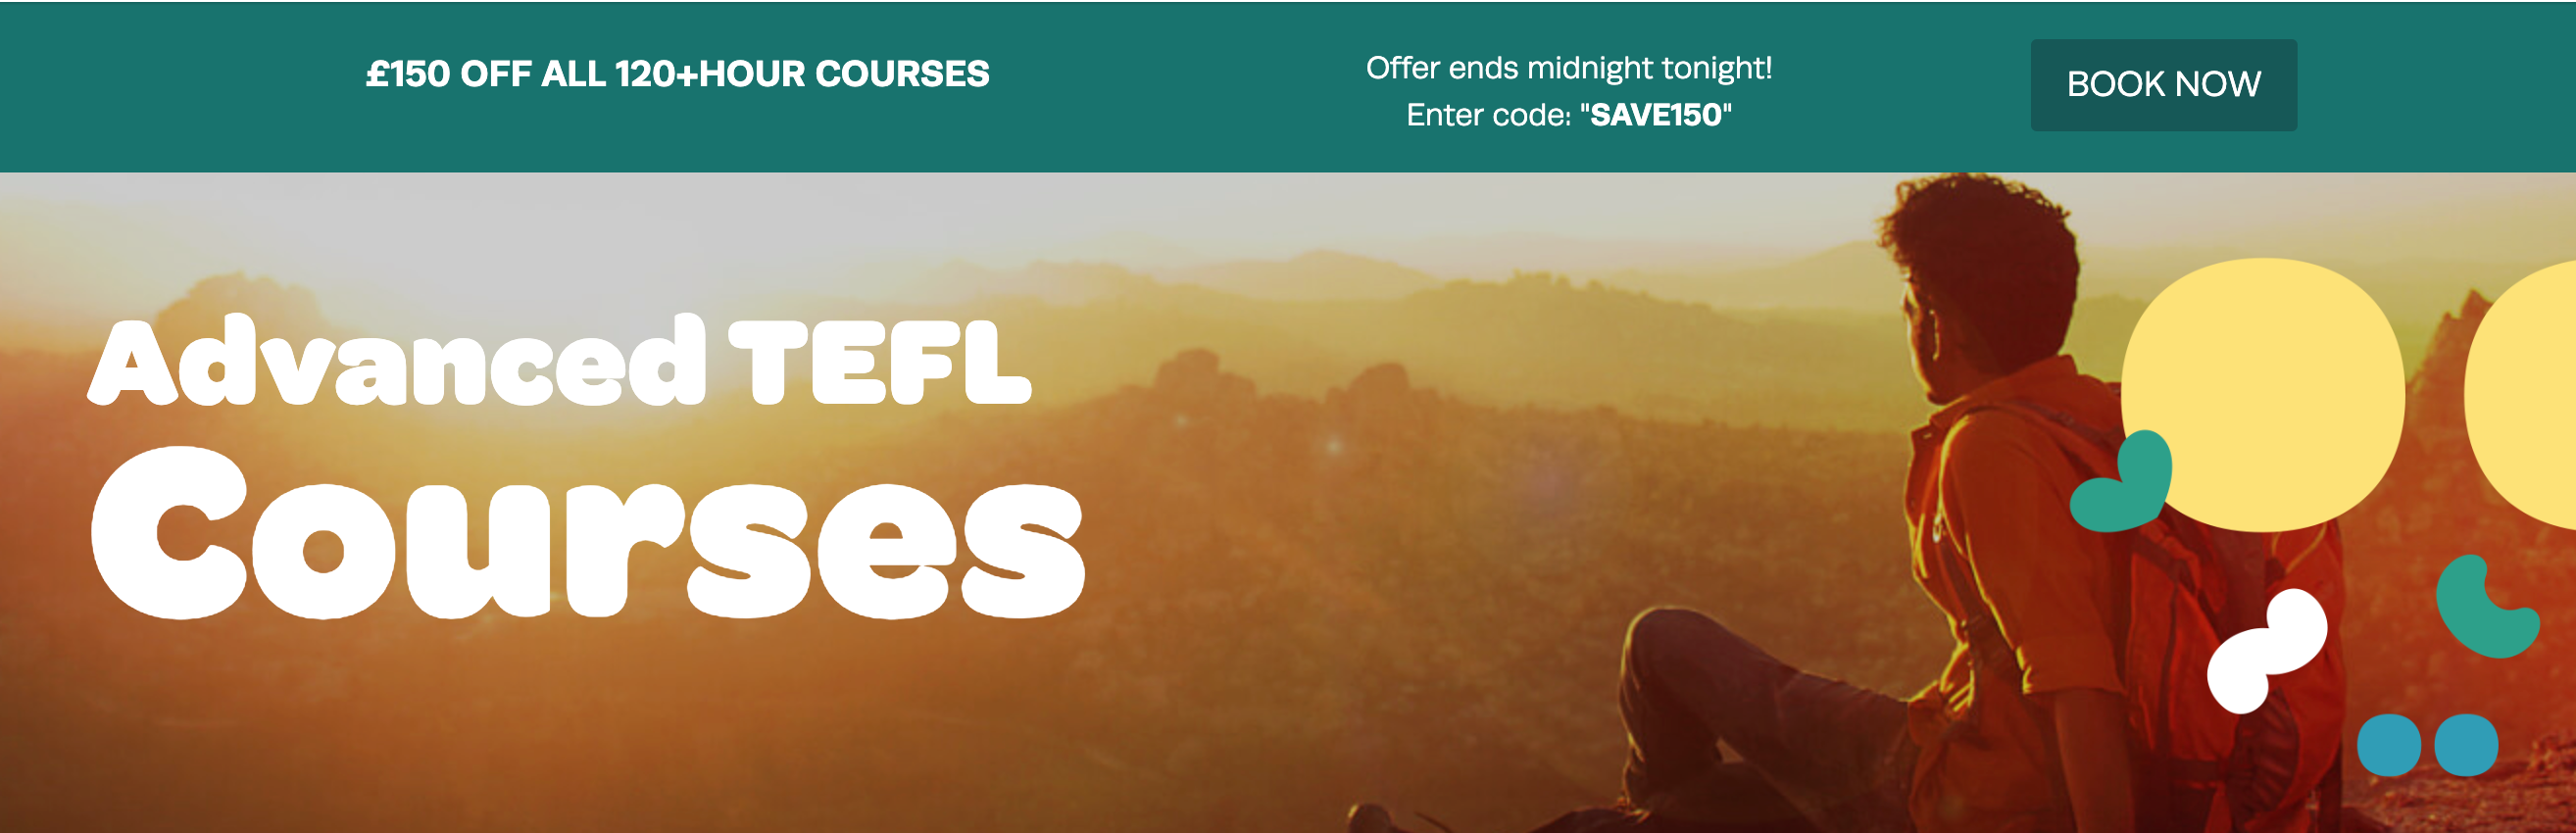 Advanced TEFL Courses - TEFL Org